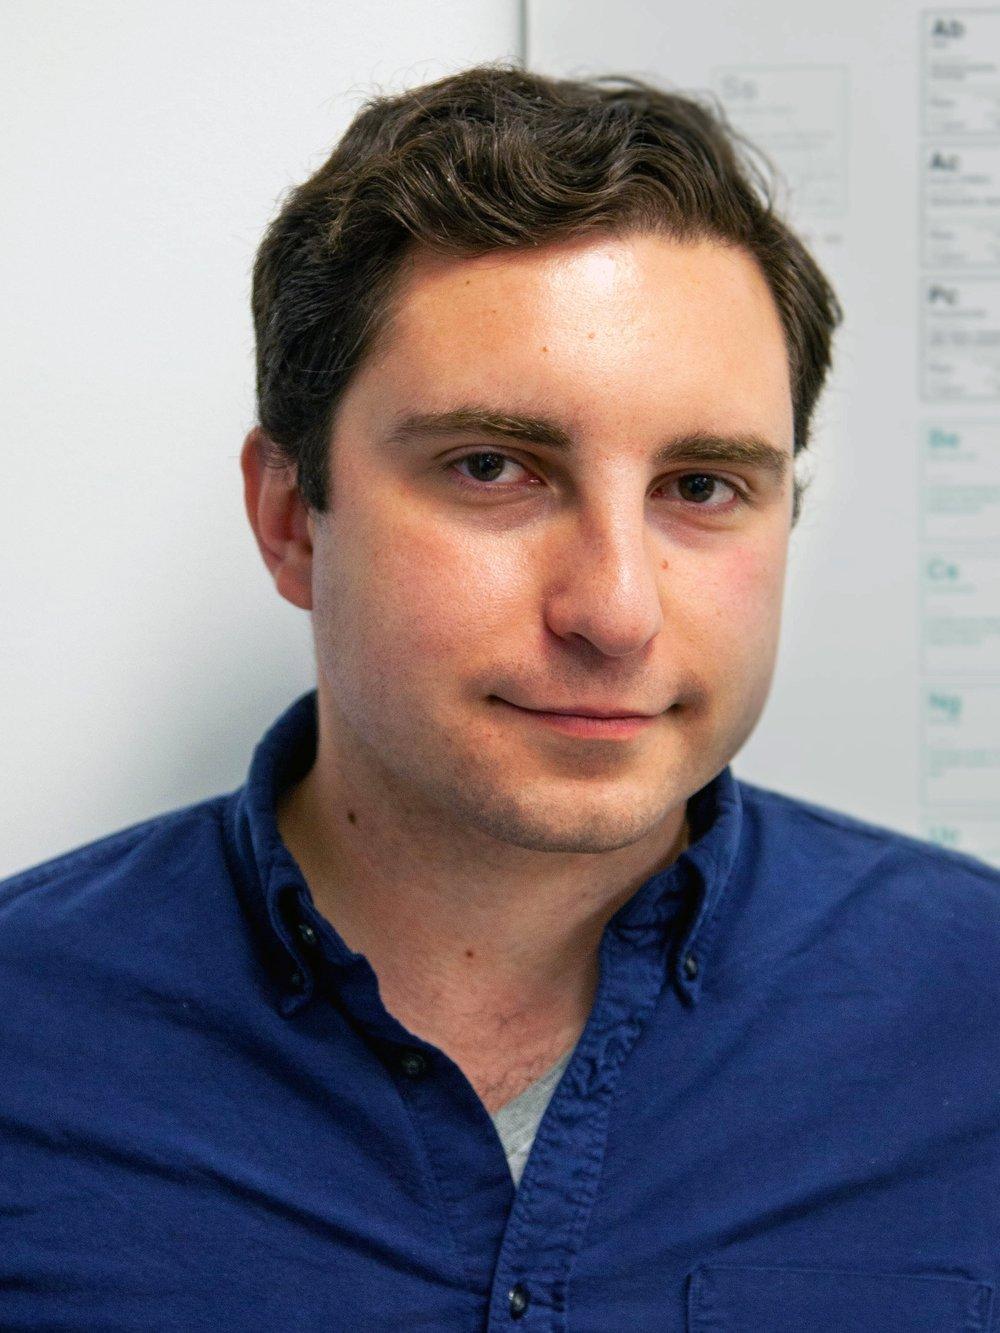 Joe Borrello, BE - Prototyping FellowPhD Student